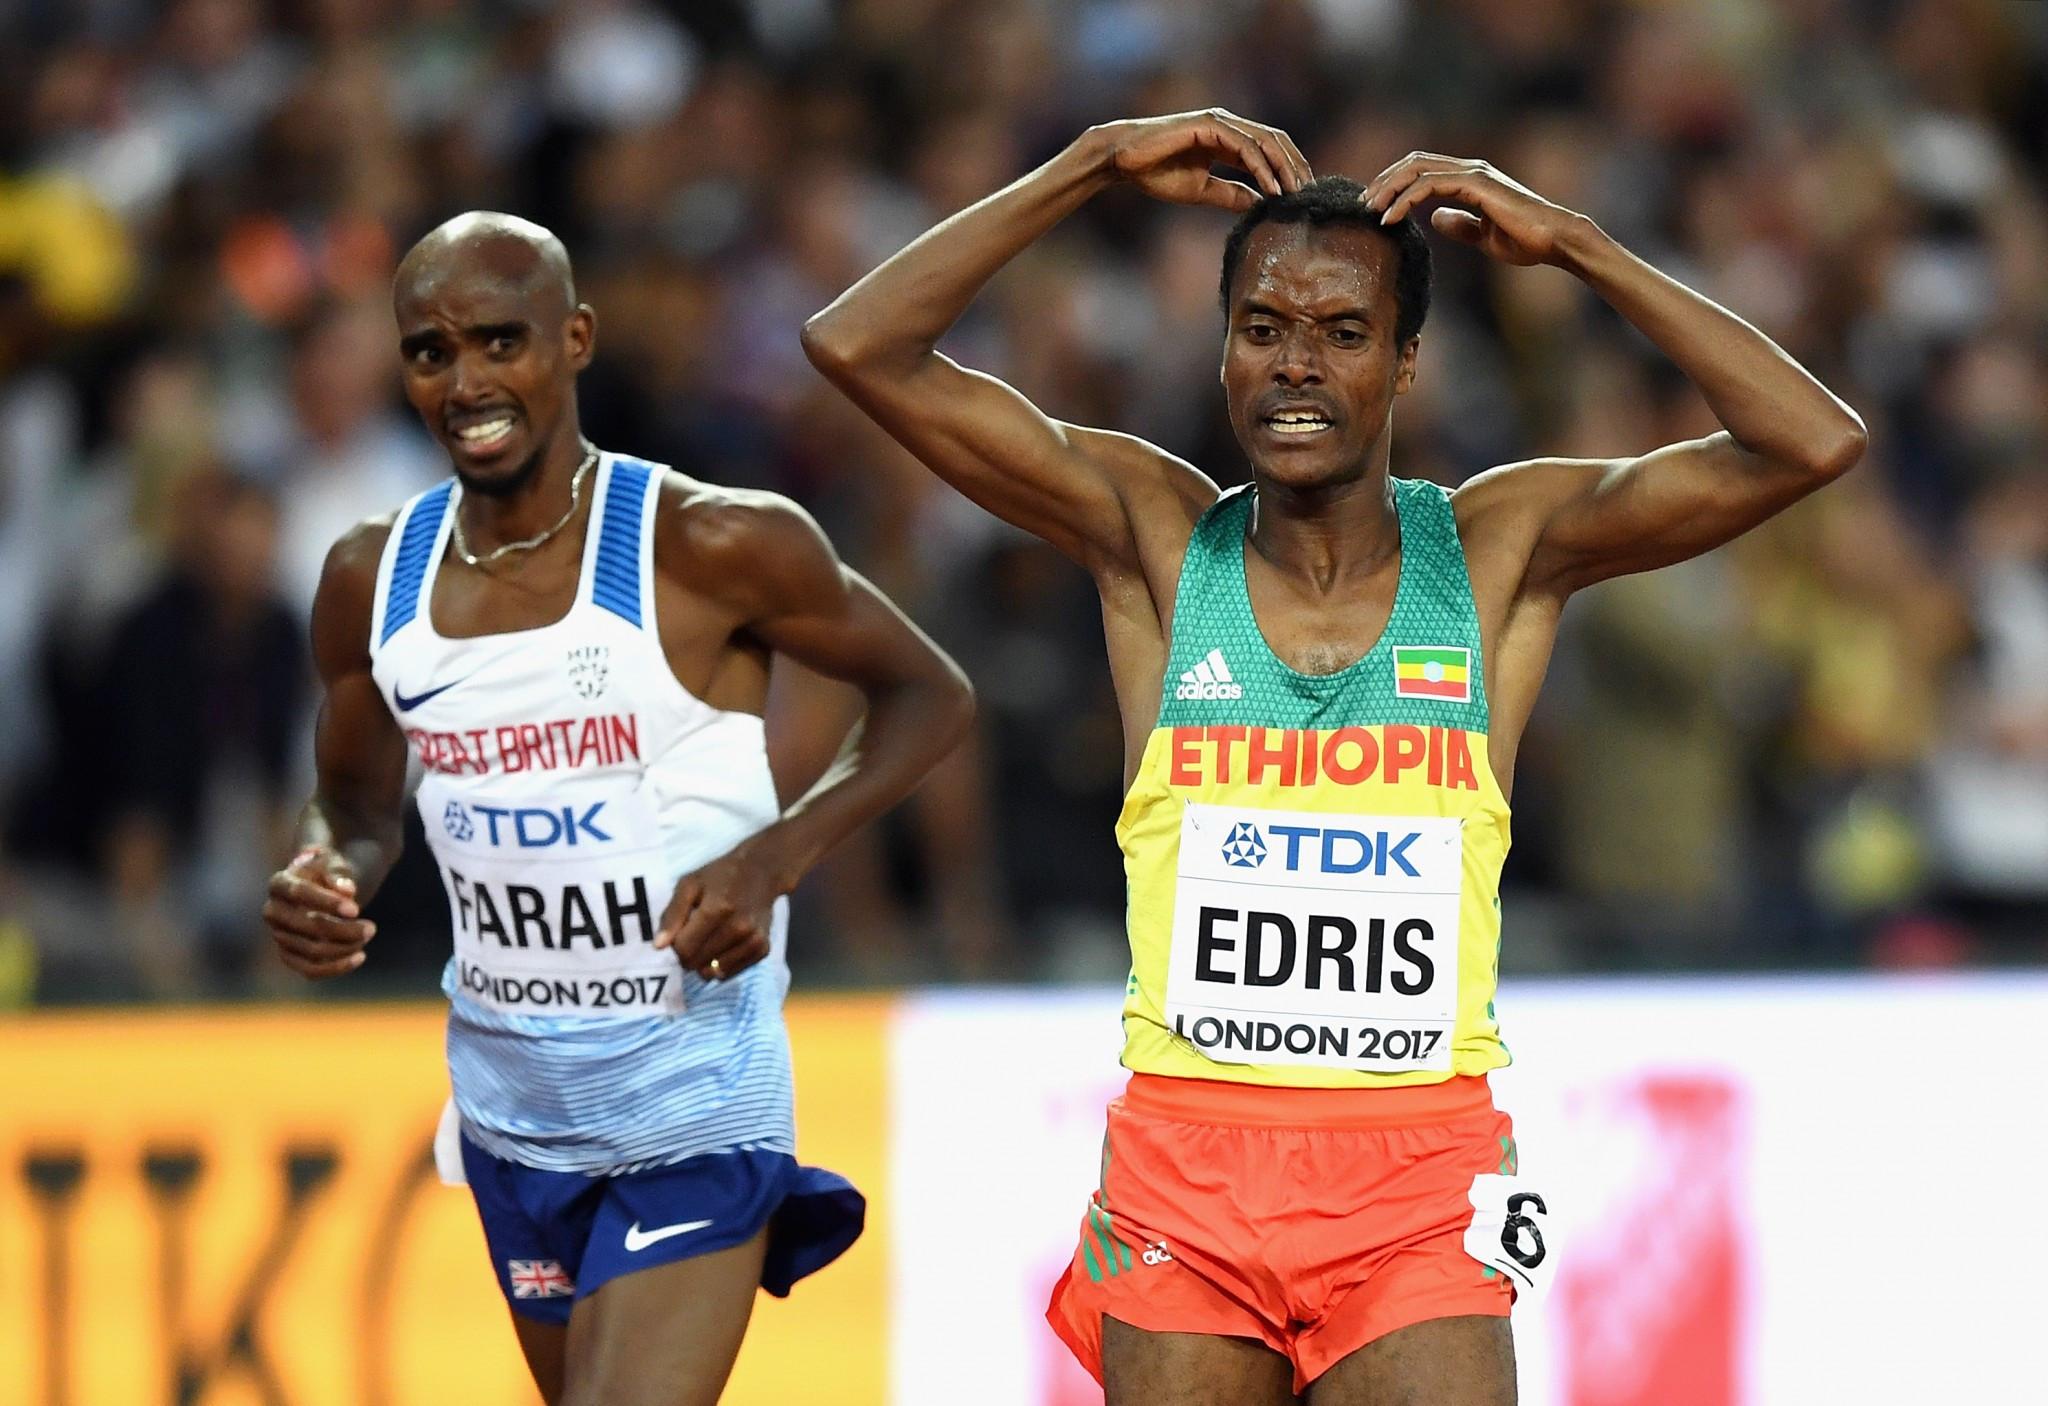 Muktar Edris shocked Sir Mo Farah to win the 5,000m ©Getty Images